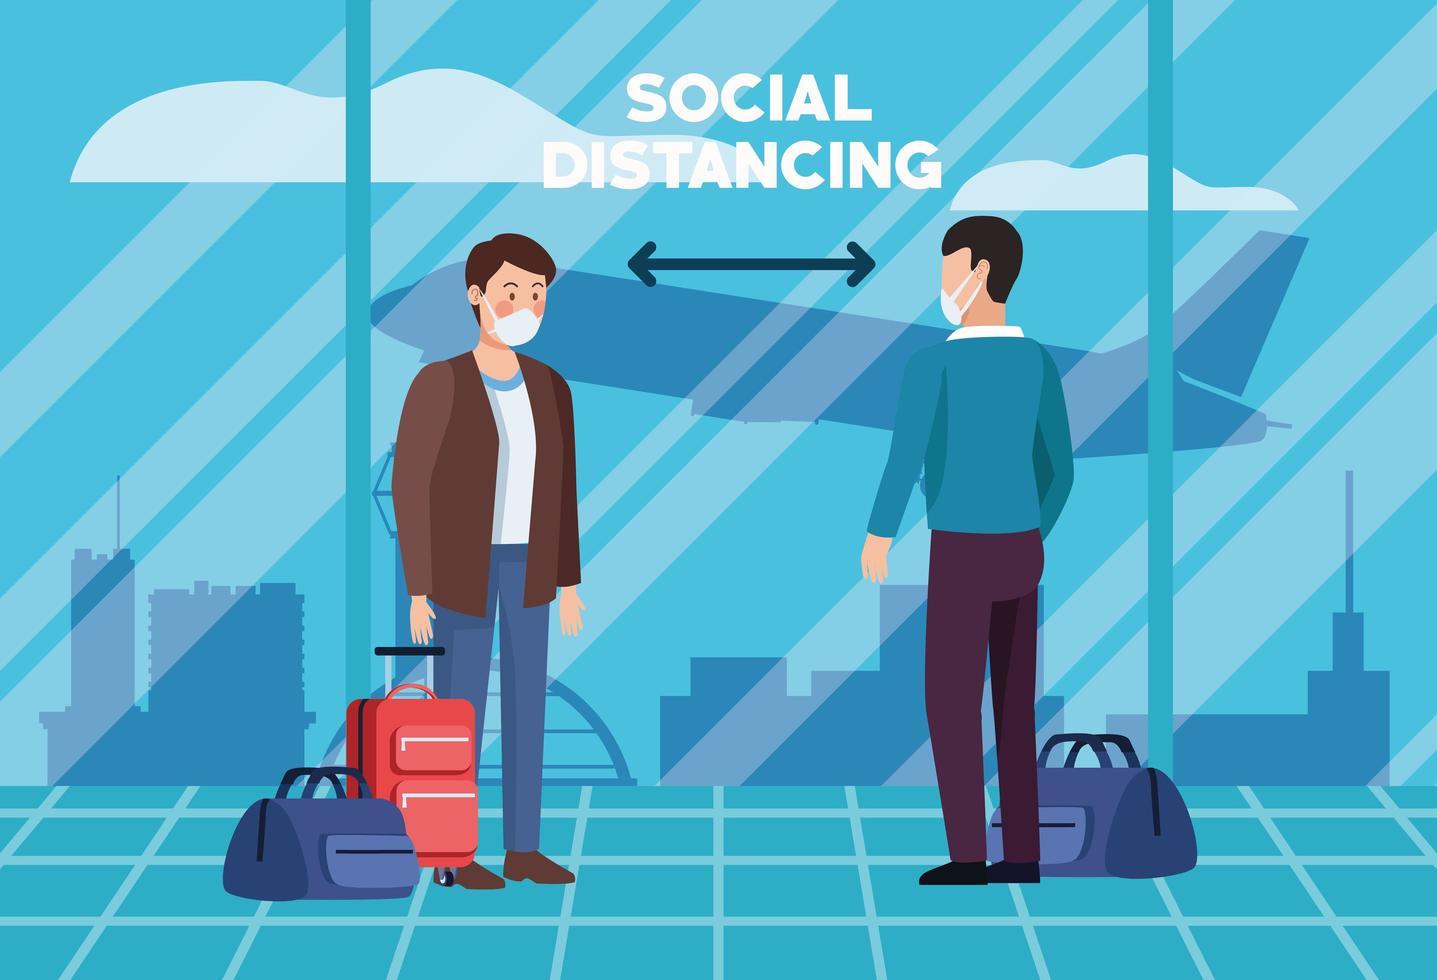 Social distancing in airport poster design  vector